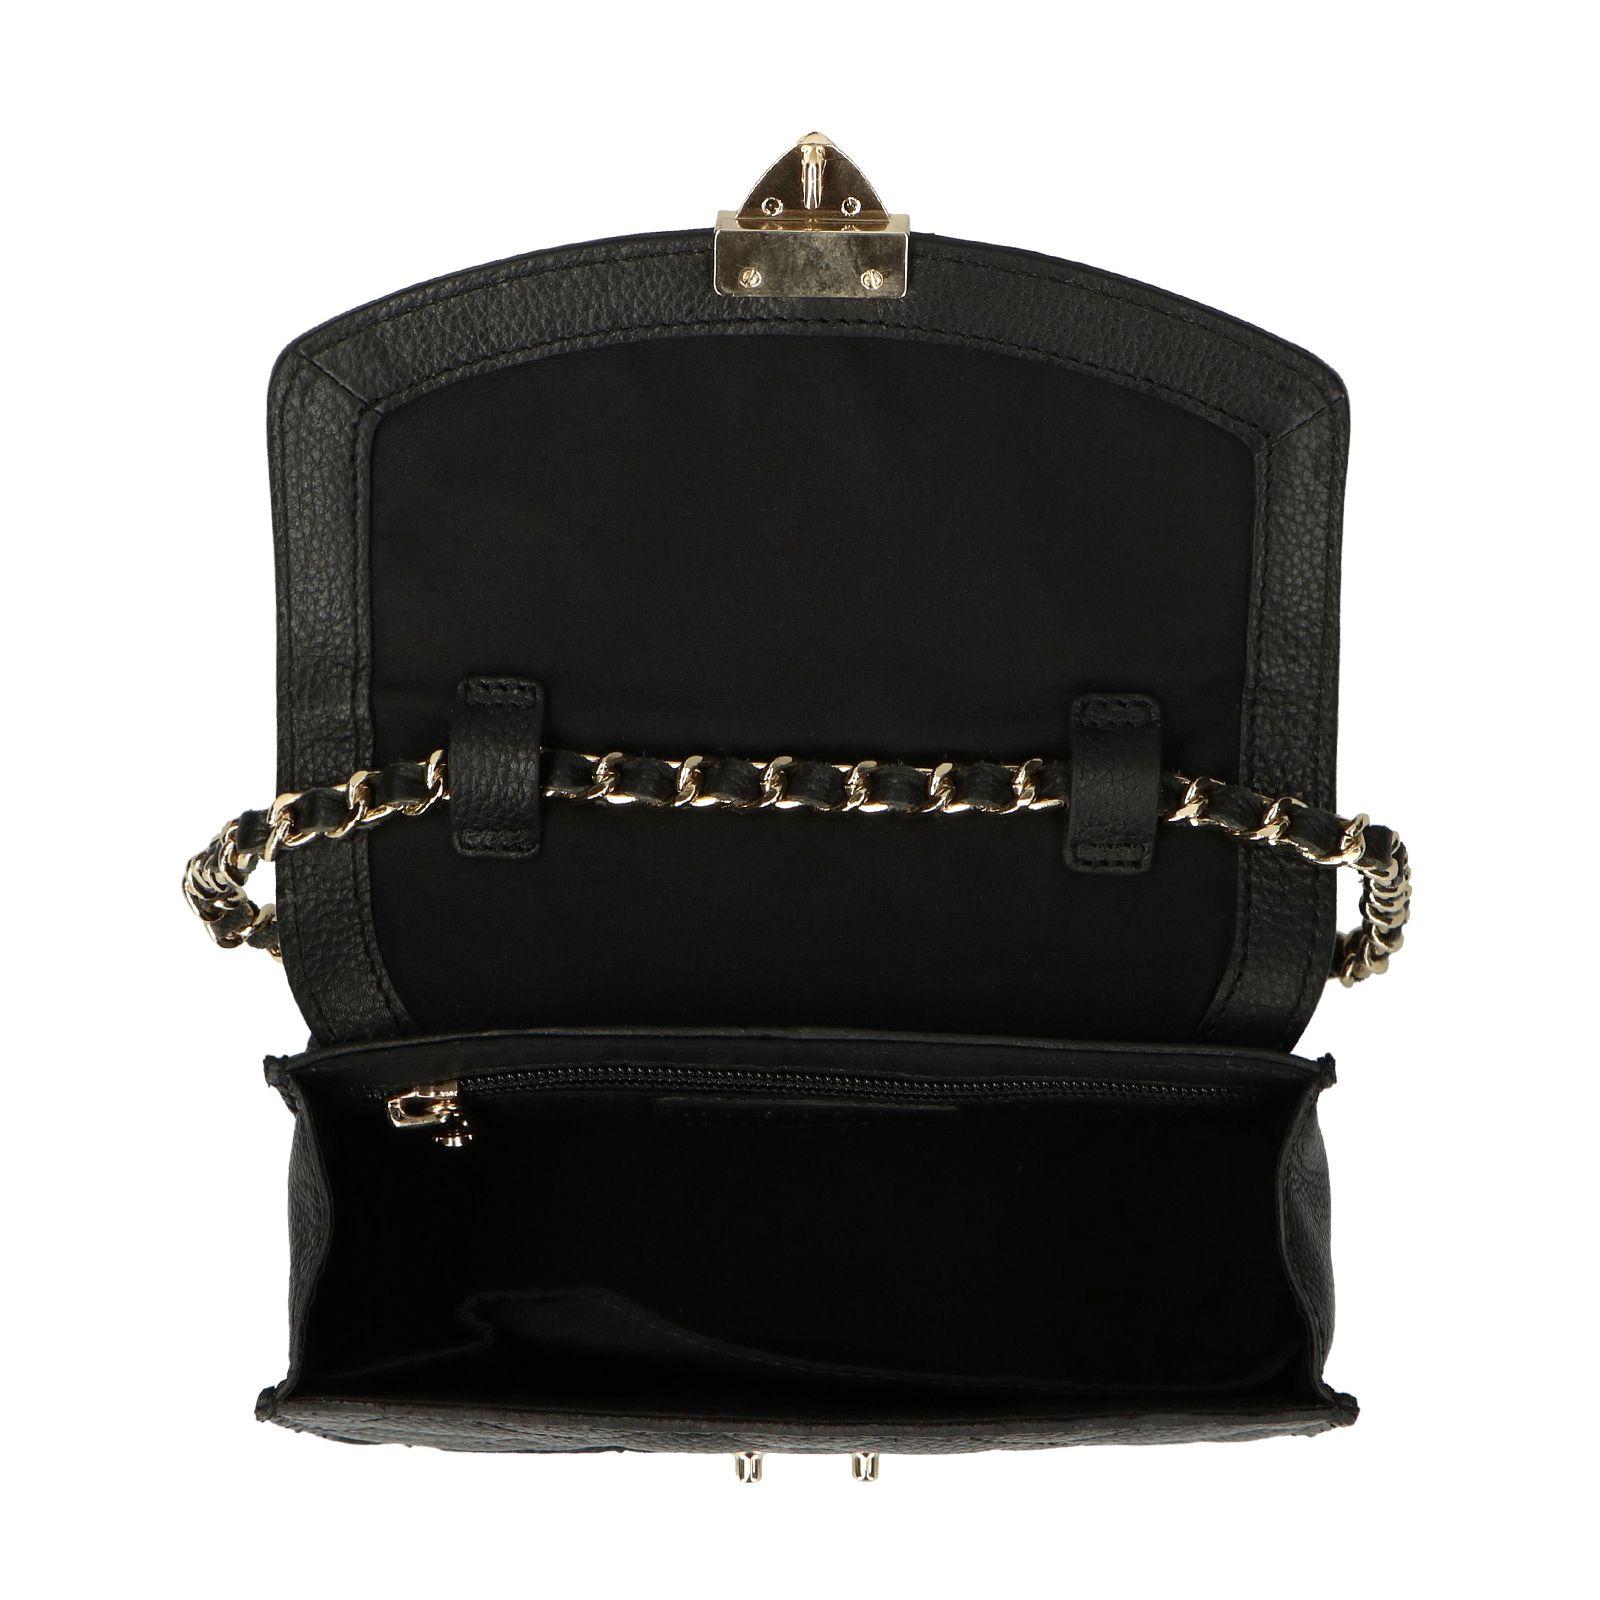 Manfield x Annic Zwarte schoudertas